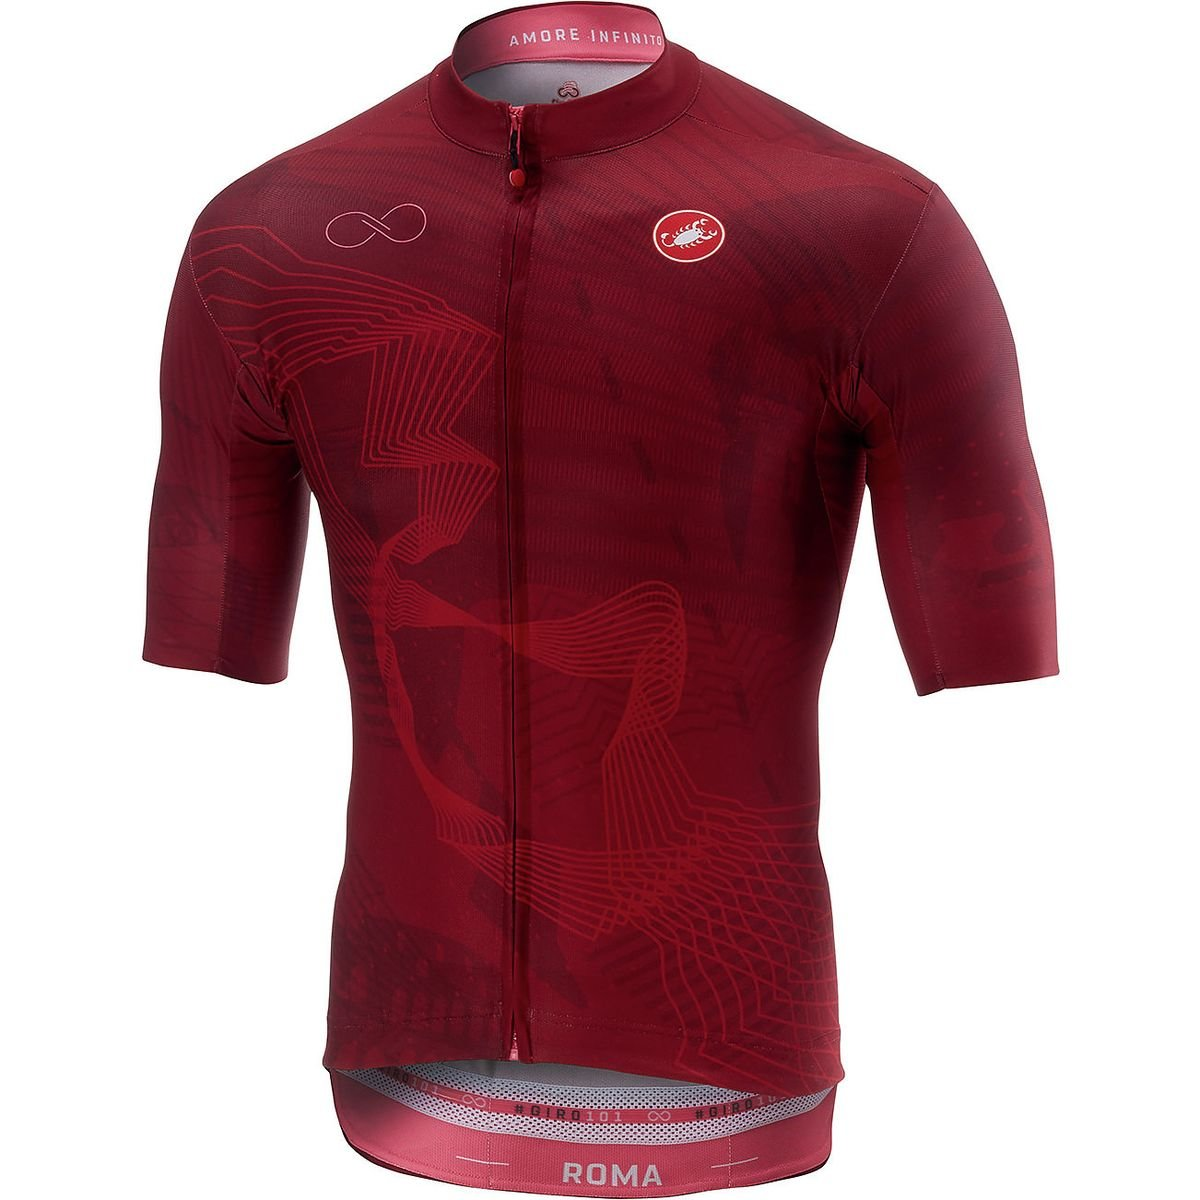 Castelli RomaフルジップJersey – Men 's B07CVN8Q7G  Rosso Porpora X-Large